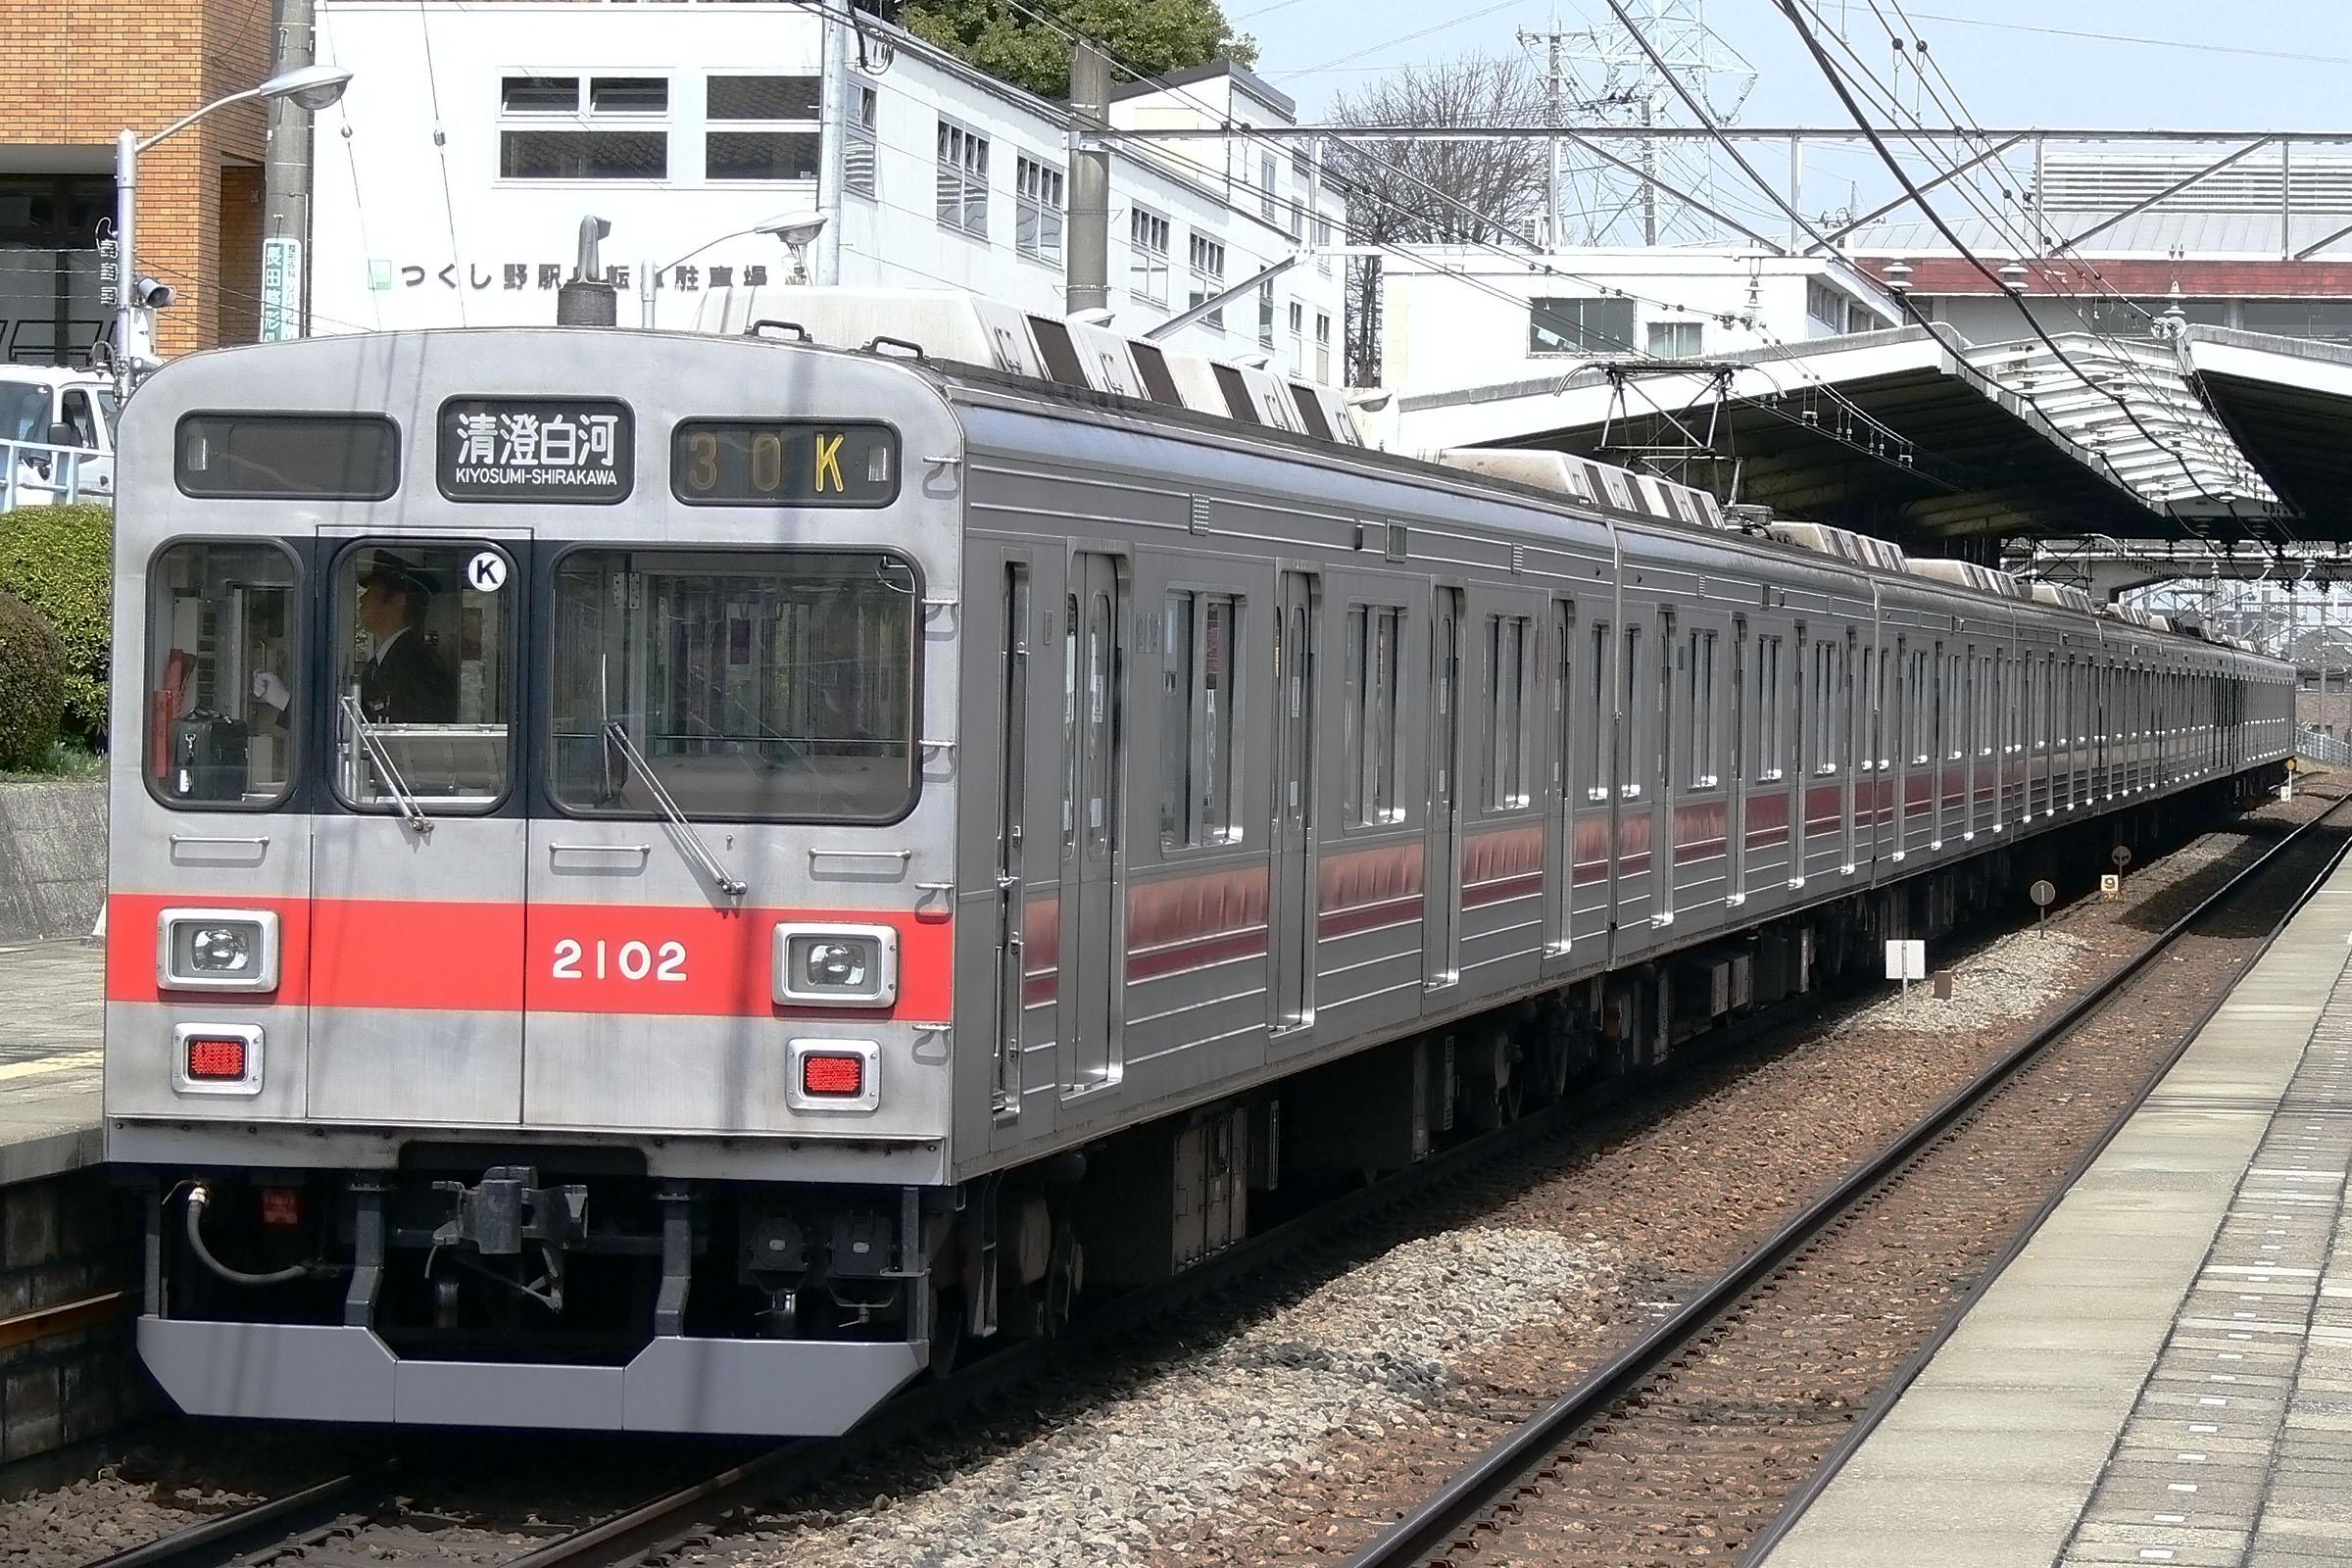 File:Tokyu2000 200603.jpg